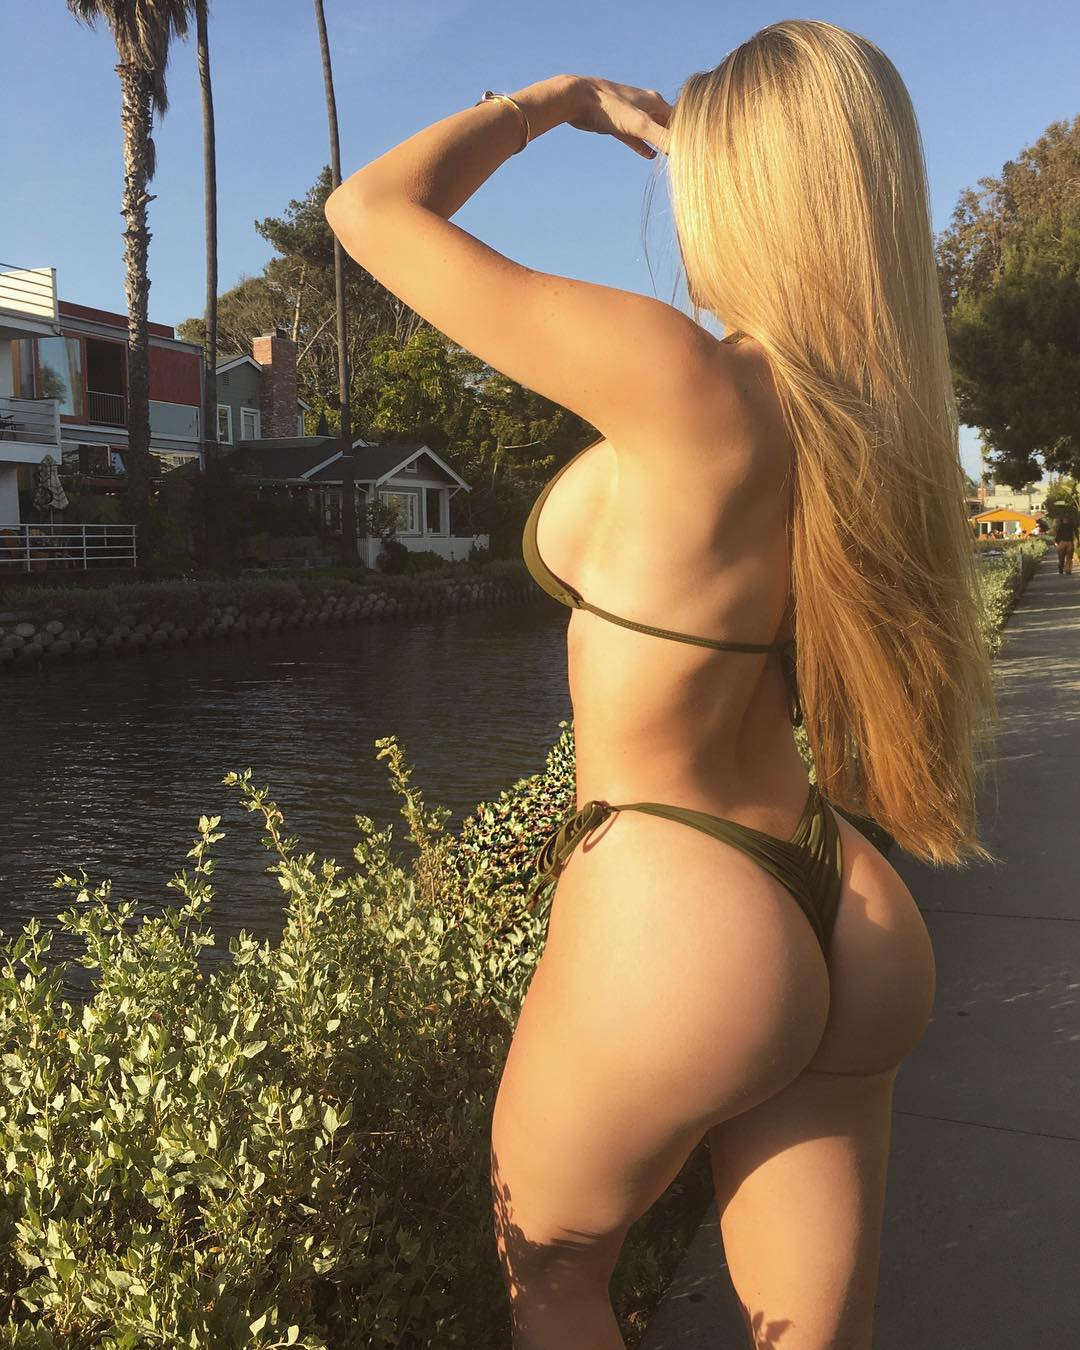 Amanda Elise Porn amanda lee porn pic - eporner